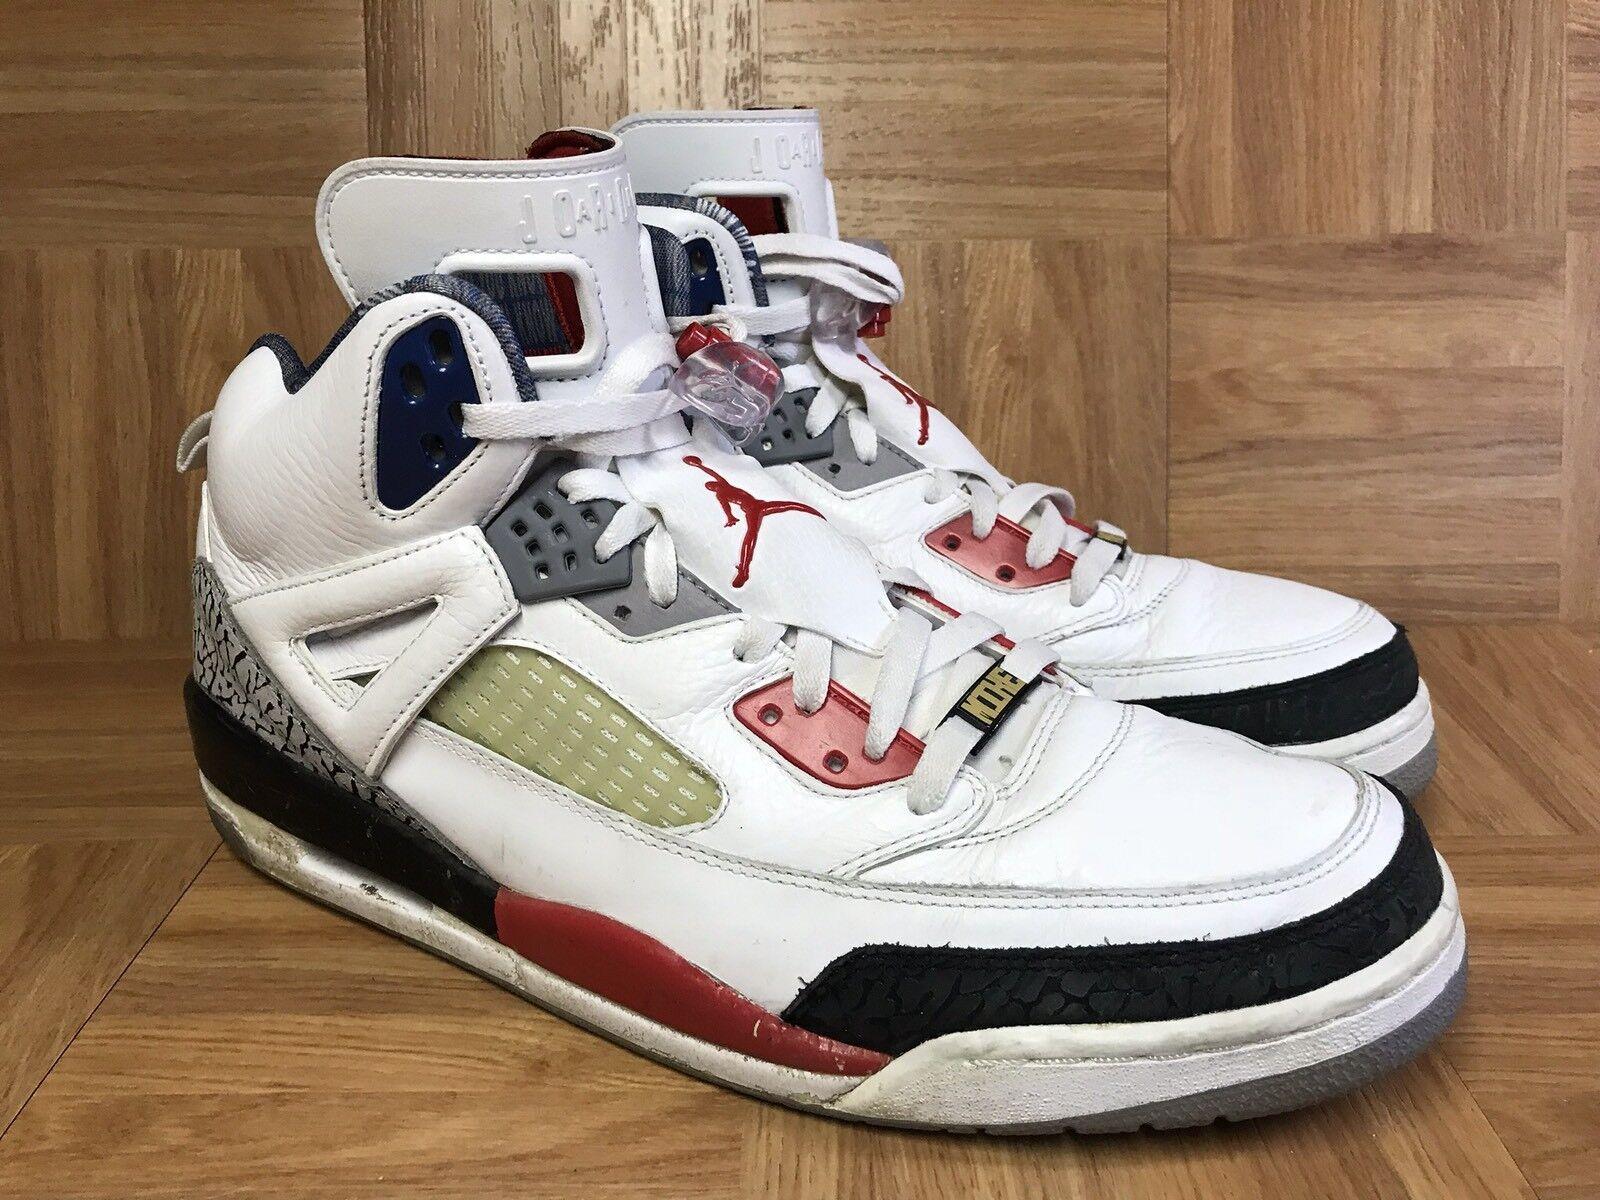 RARE Nike Air Jordan Spizike Mars Blackmon White Fire Red Black 14 315371-165